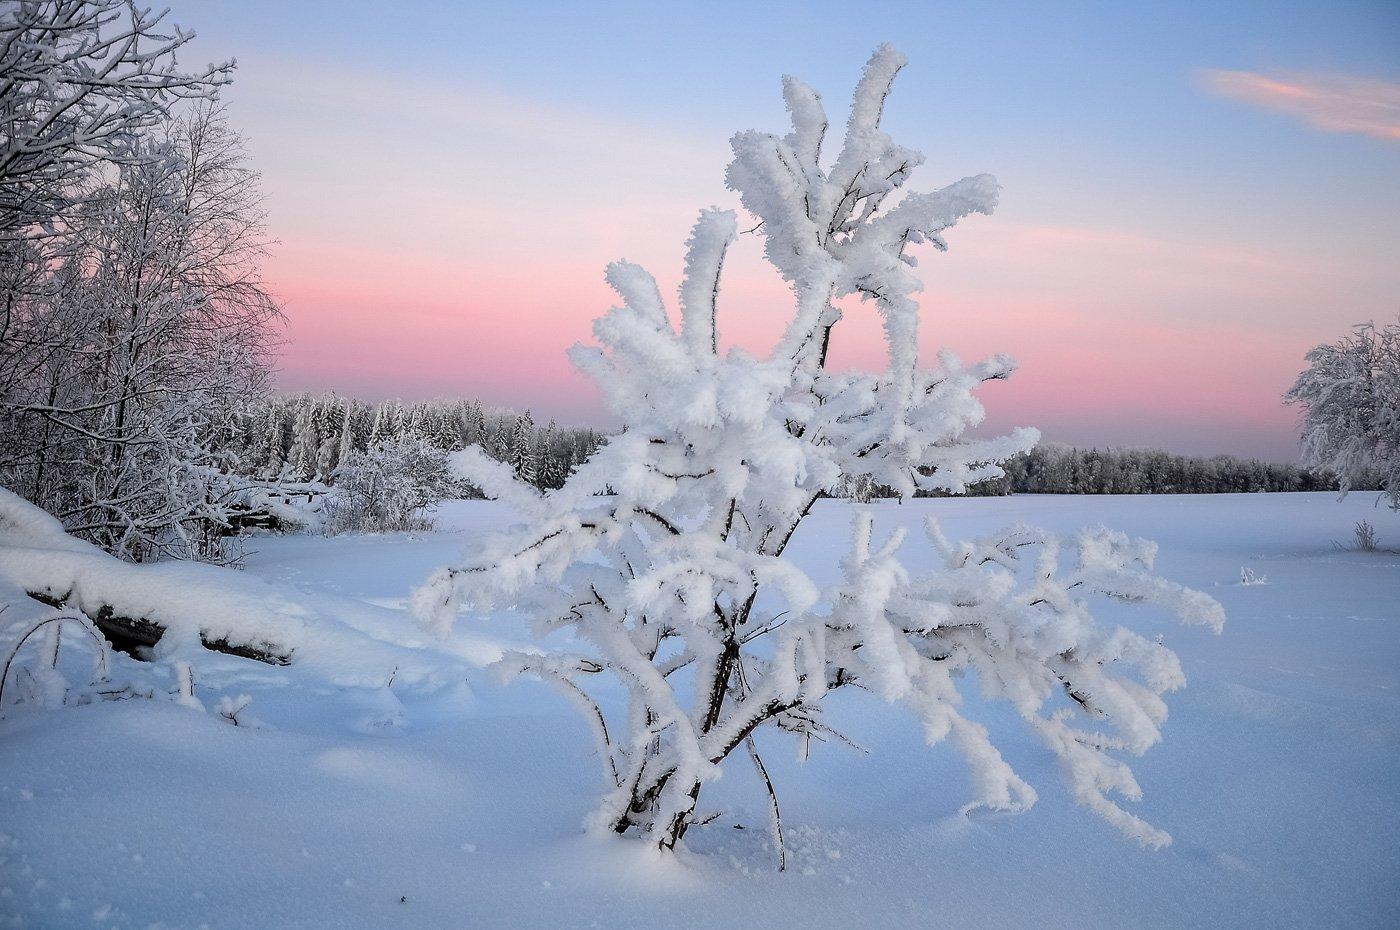 удмуртия, зима, иней,кез, АНДРЕЙ LOZHKIN